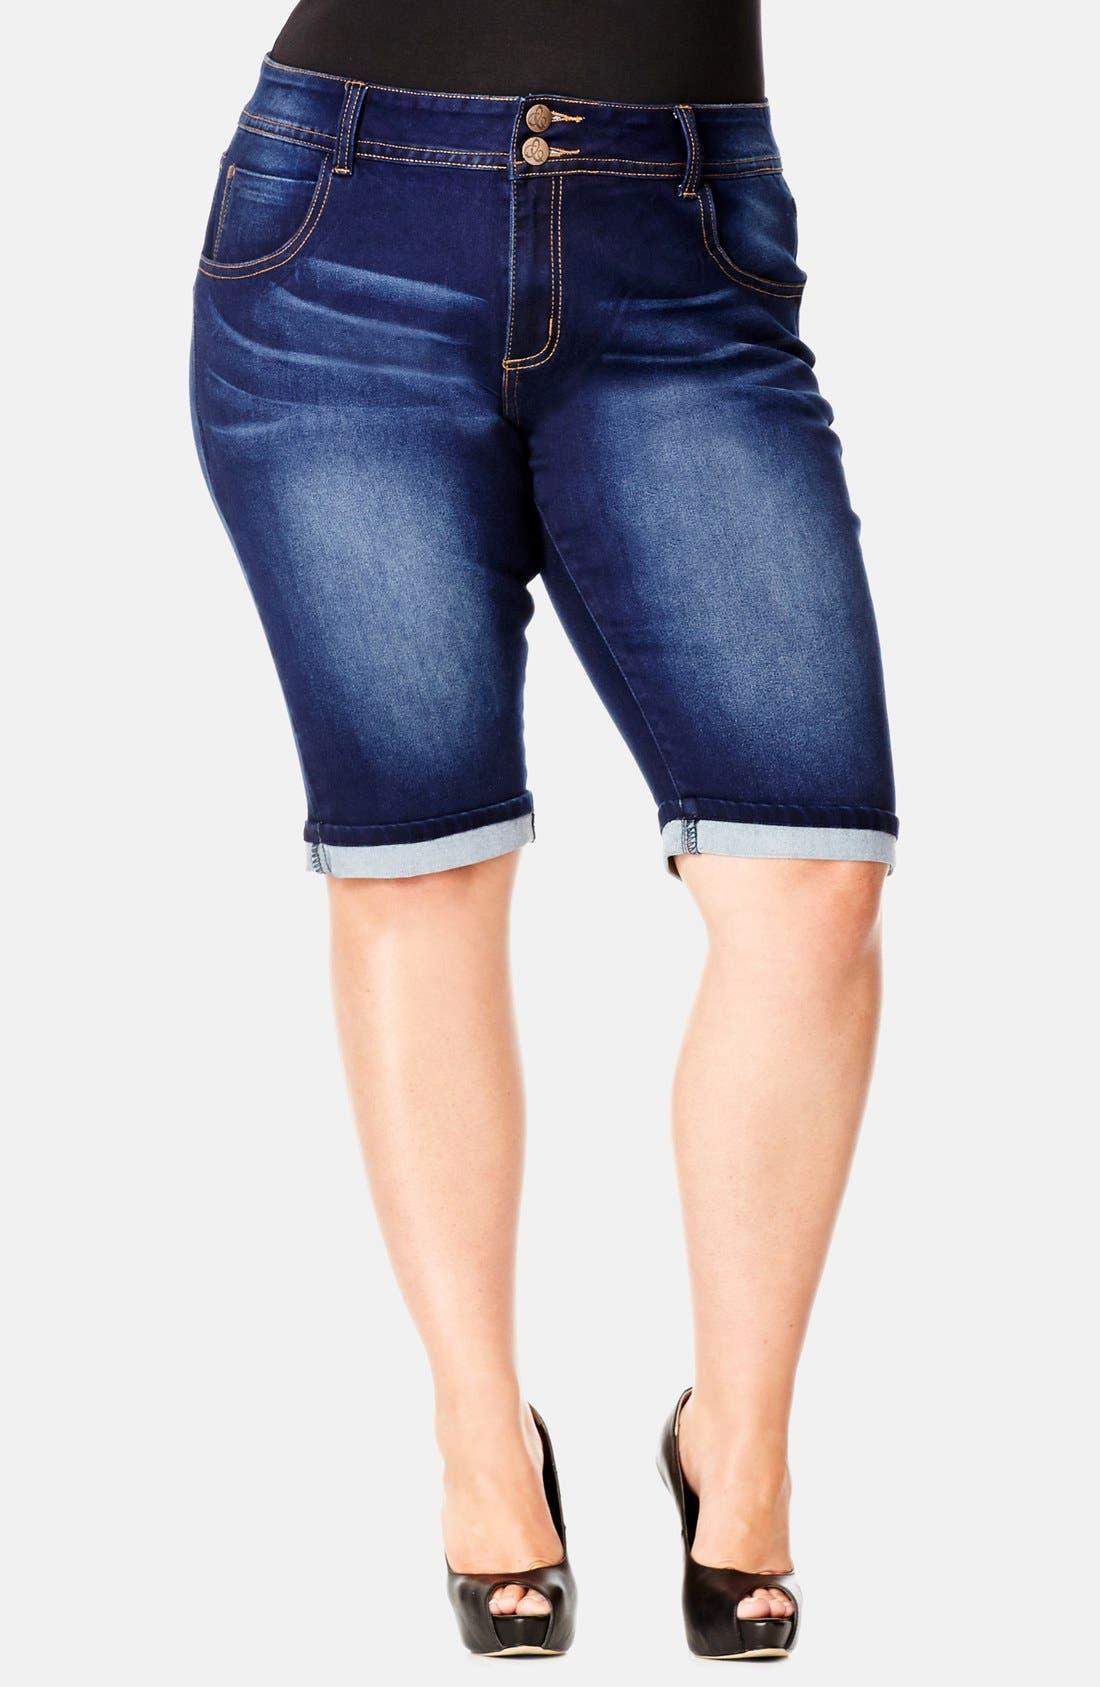 Alternate Image 1 Selected - City Chic Denim Bermuda Shorts (Plus Size)